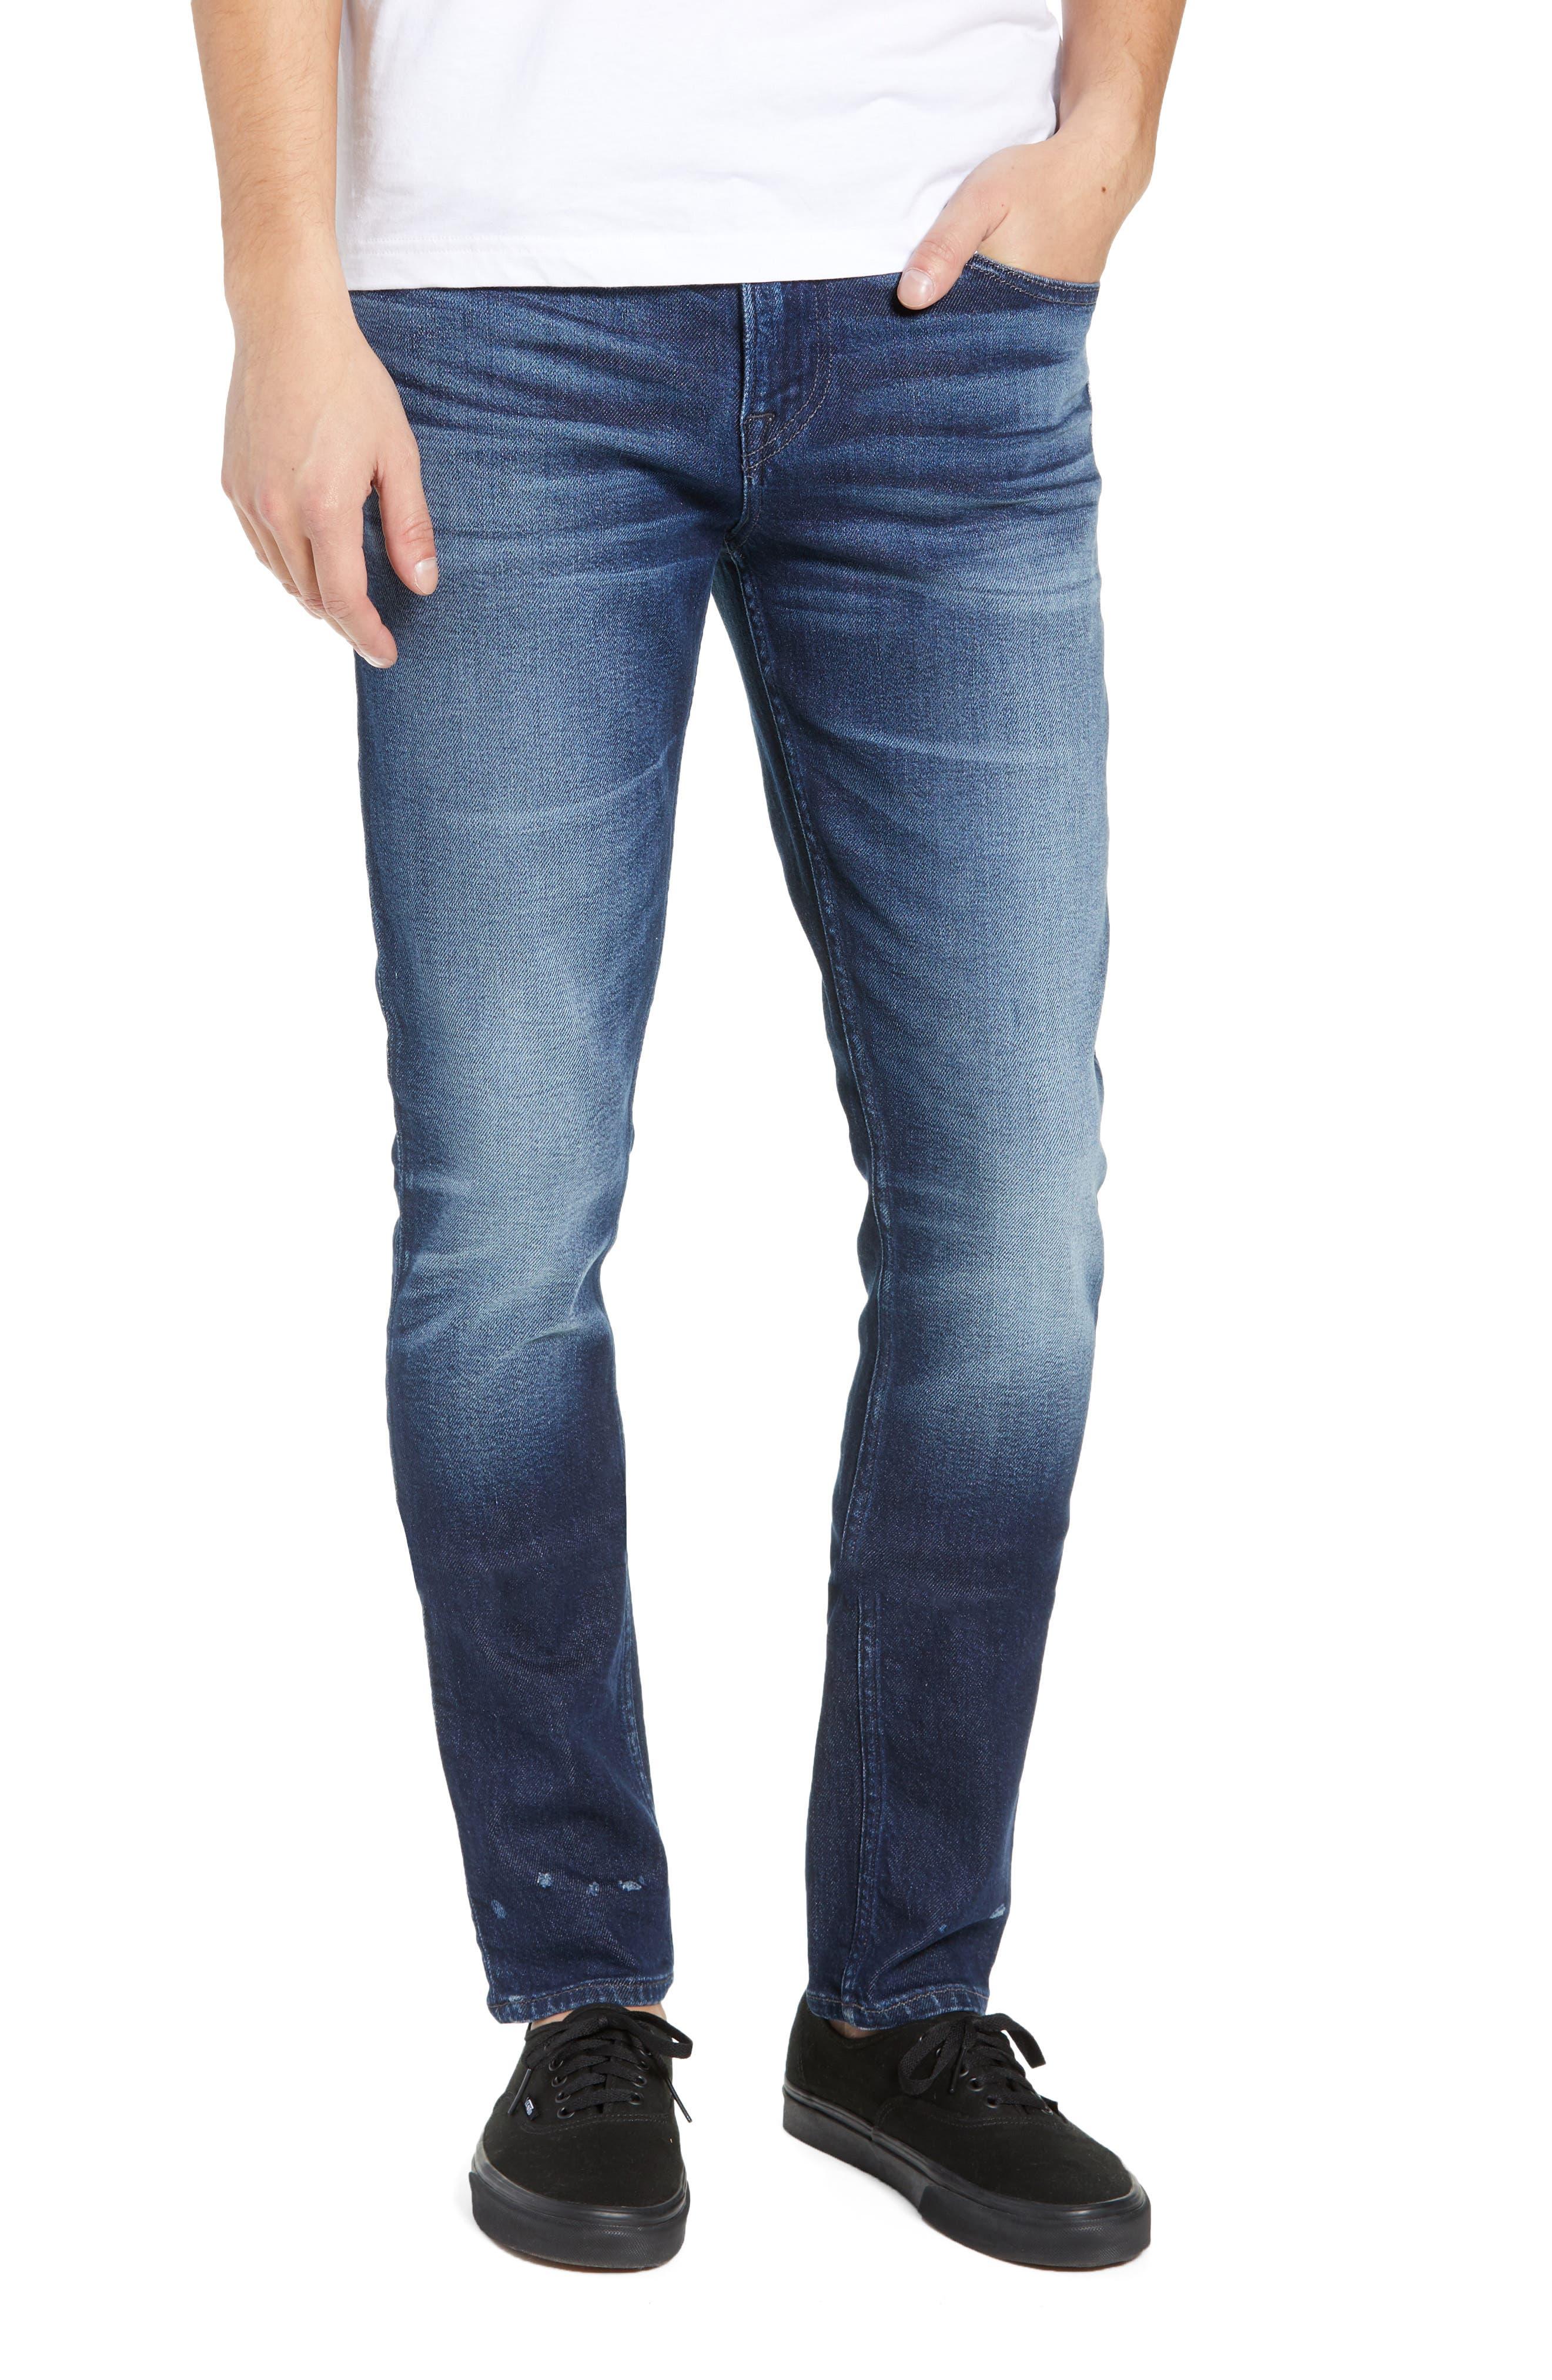 Axl Skinny Fit Jeans,                             Main thumbnail 1, color,                             BENNETT